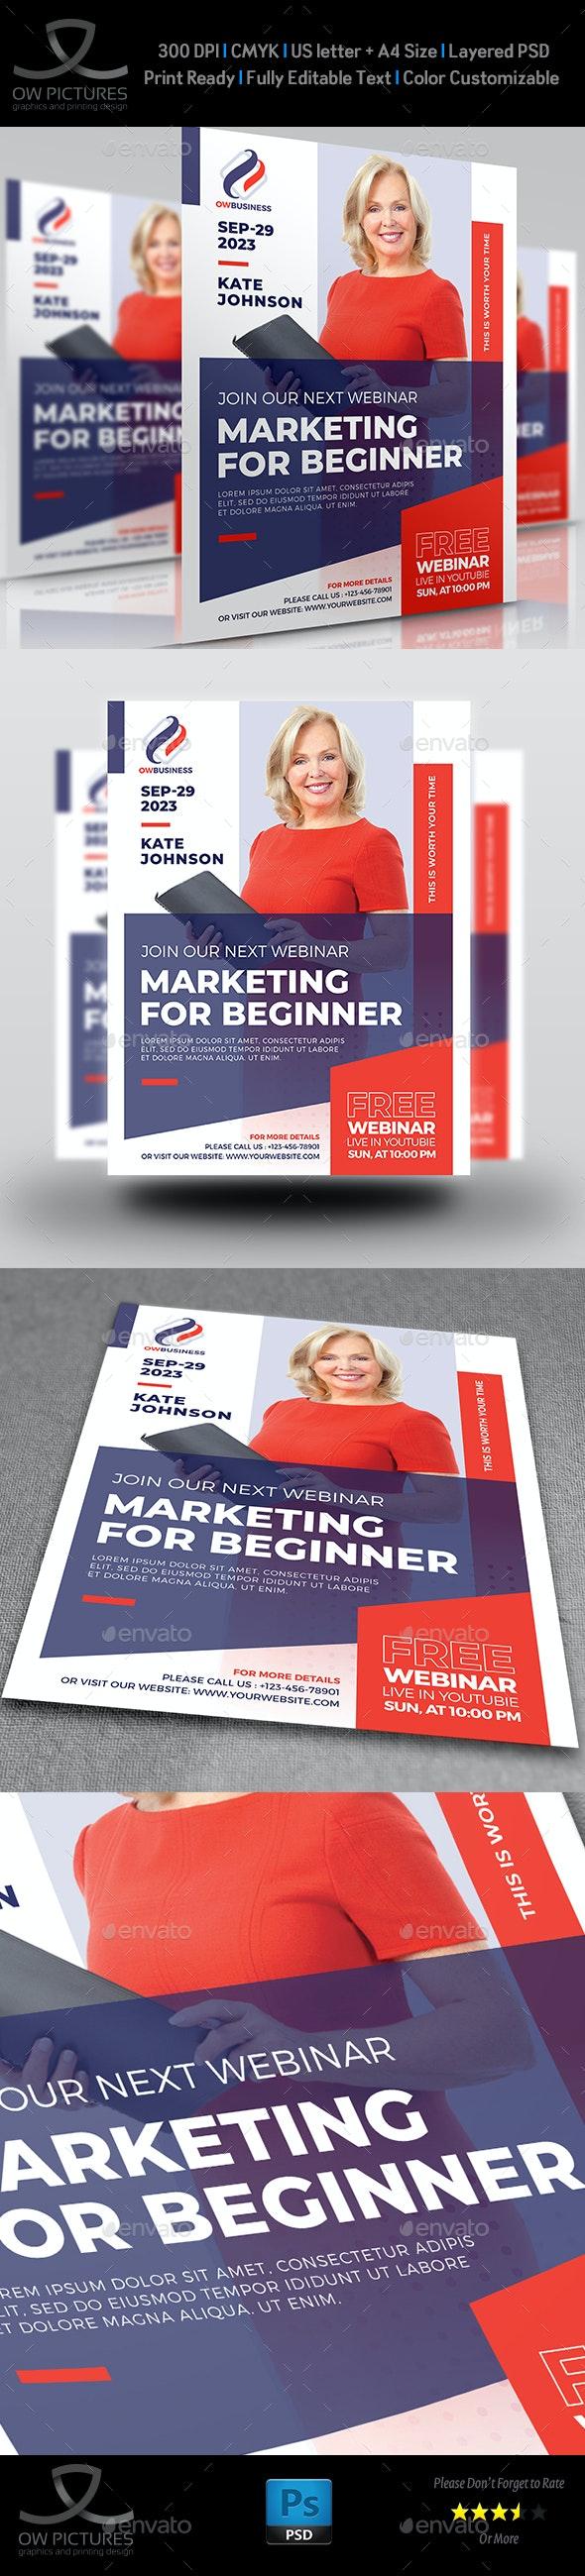 Webinar Flyer - Seminar Flyer Template - Flyers Print Templates